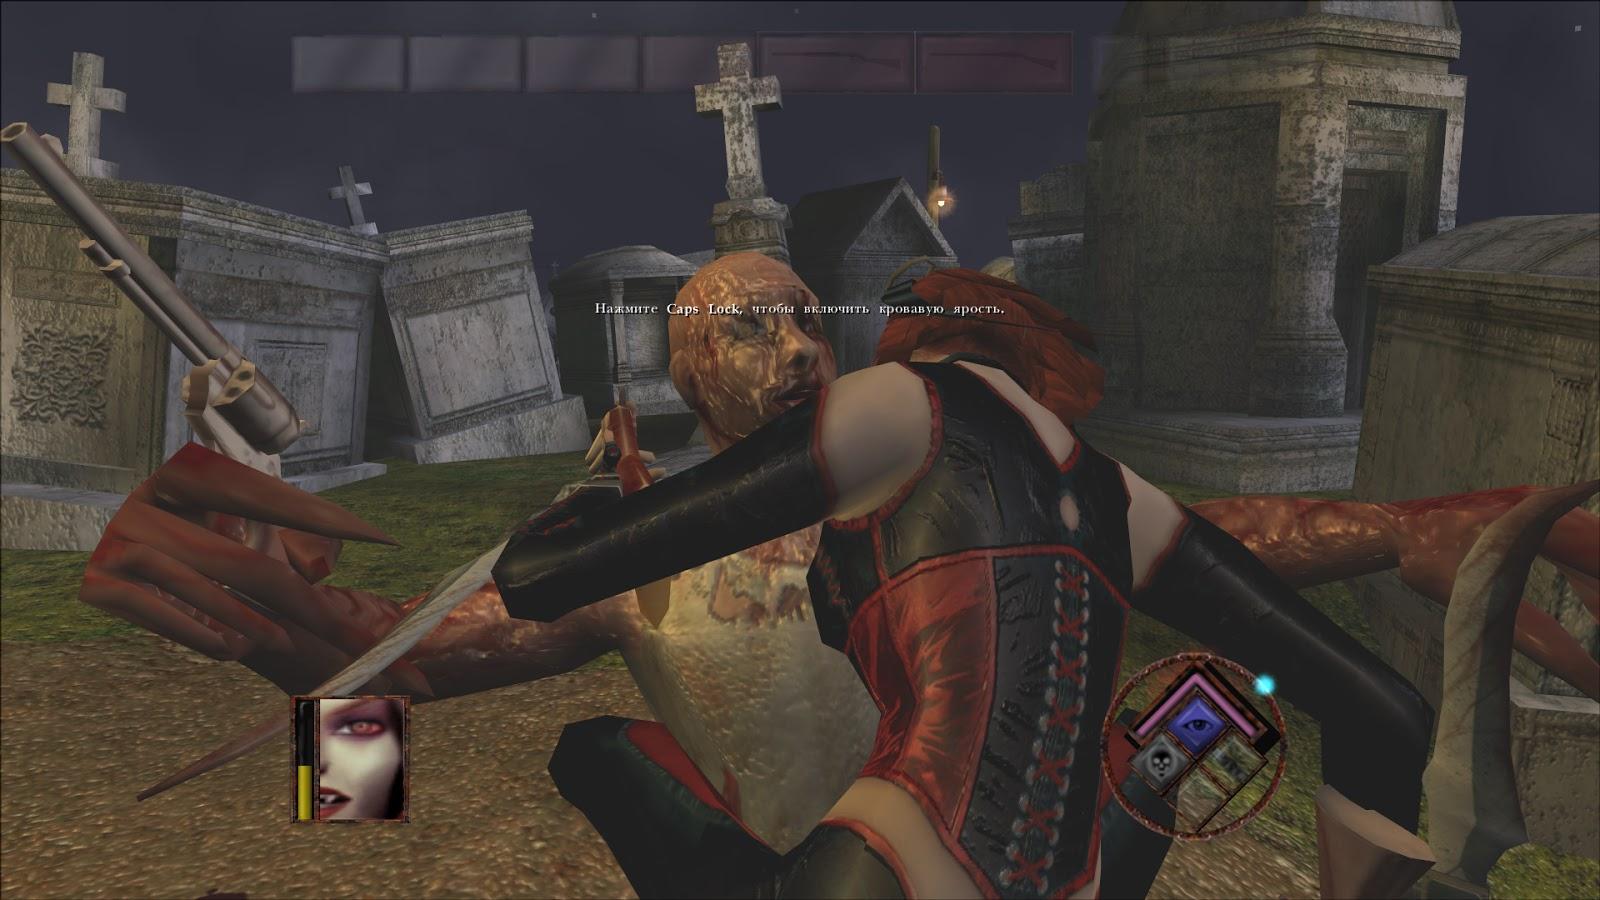 BloodRayne (2xRus – Eng) RePack PC Game 850mb